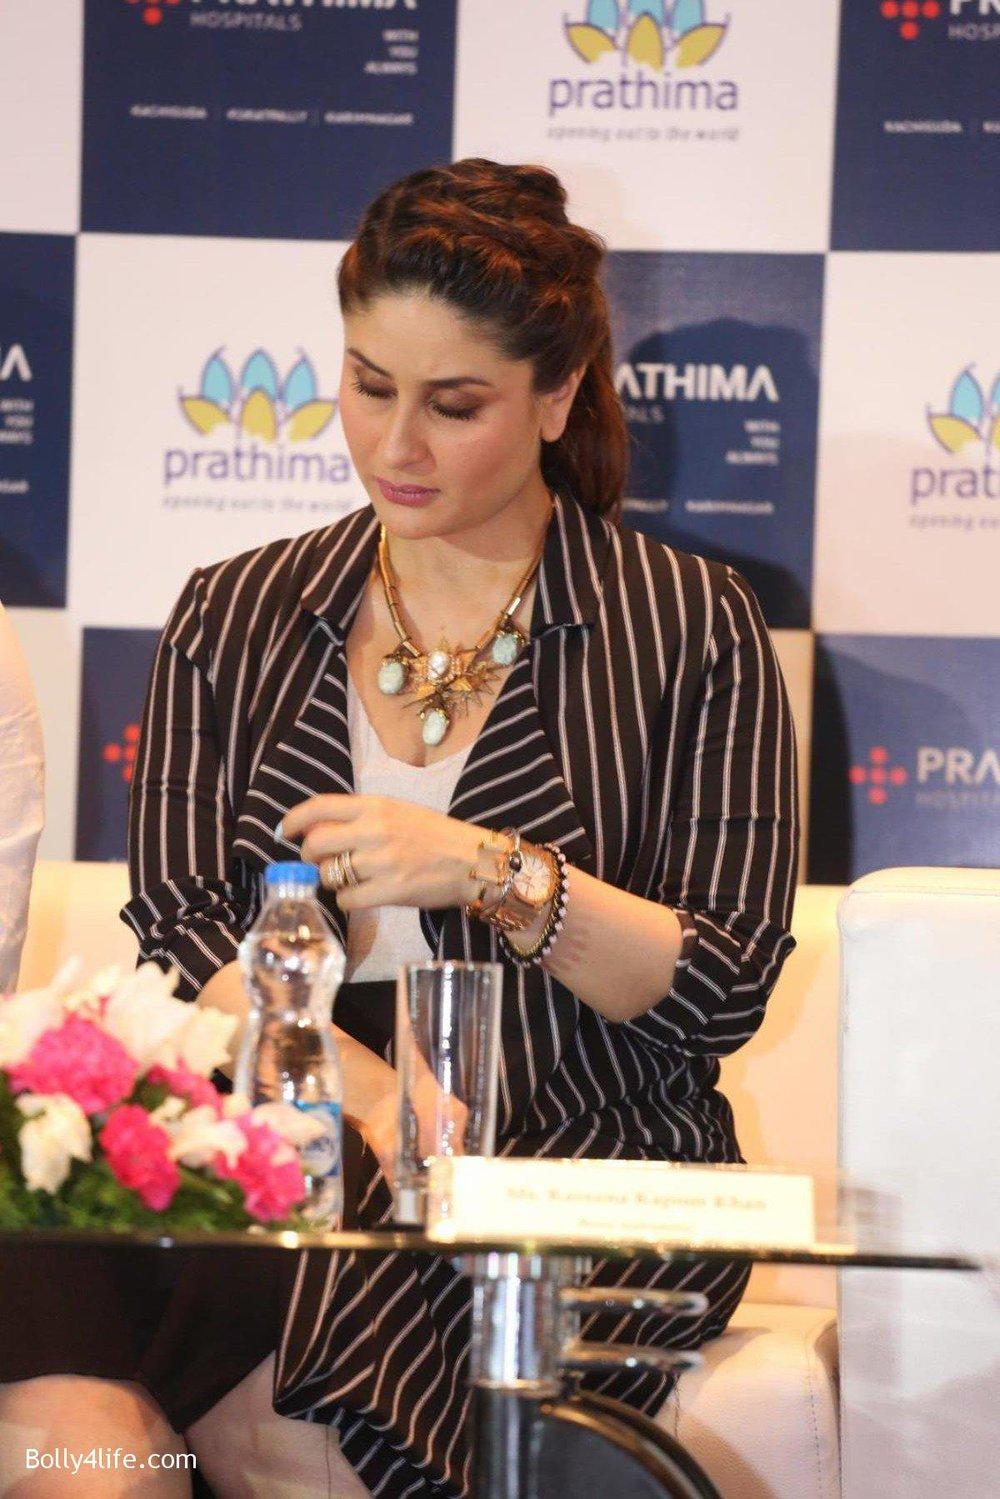 kareena-kapoor-prathima-hospitals-brand-ambassador-11.jpg